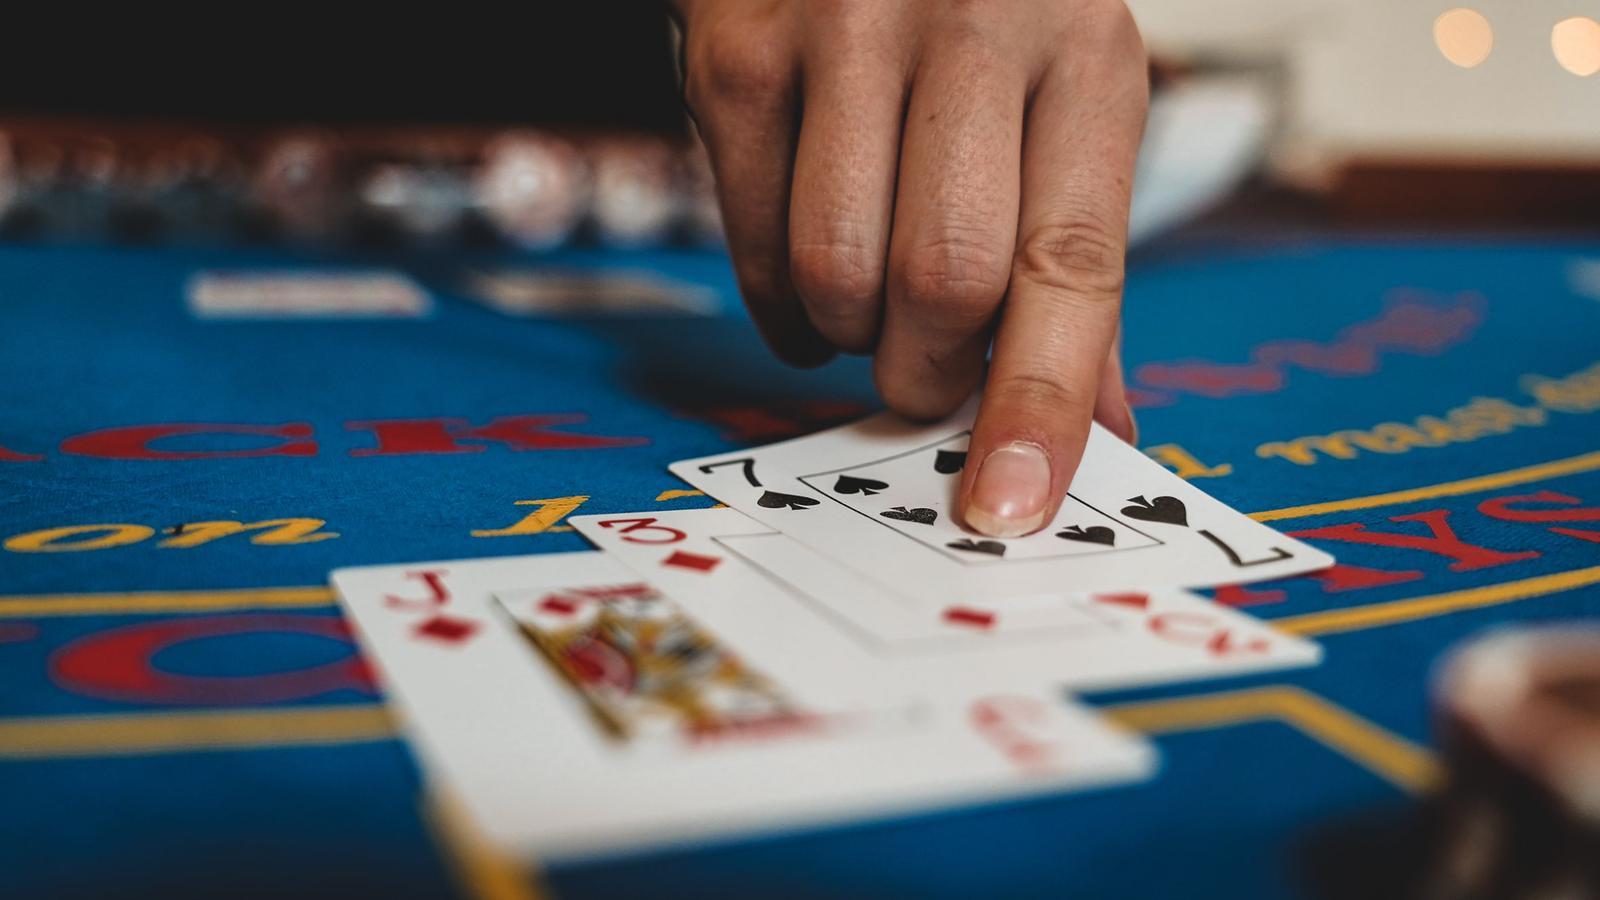 croupier dealing blackjack card